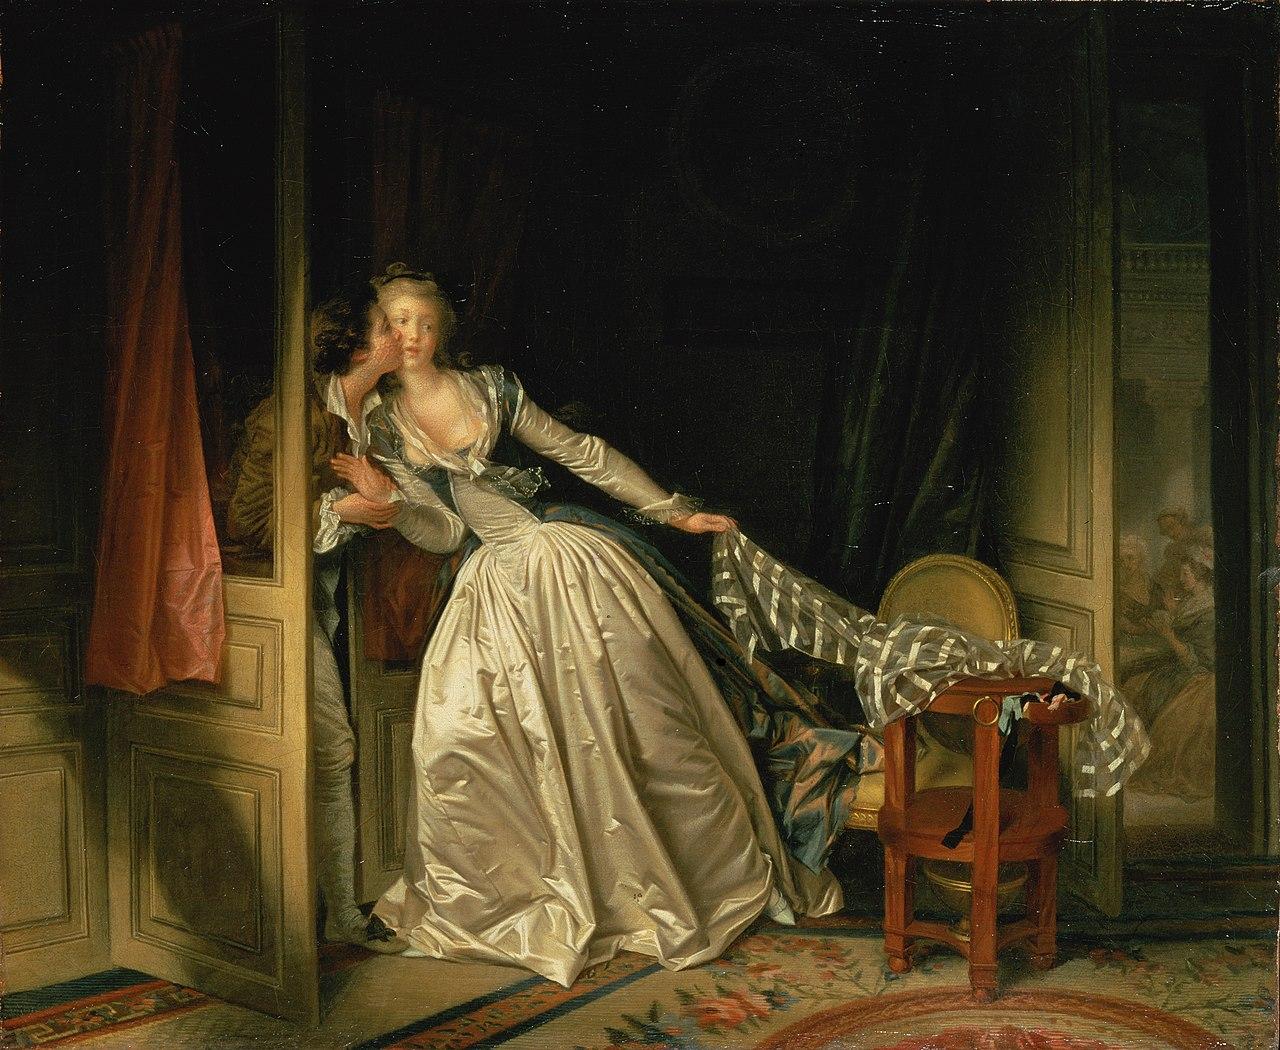 Jean-Honoré Fragonard, The Stolen Kiss